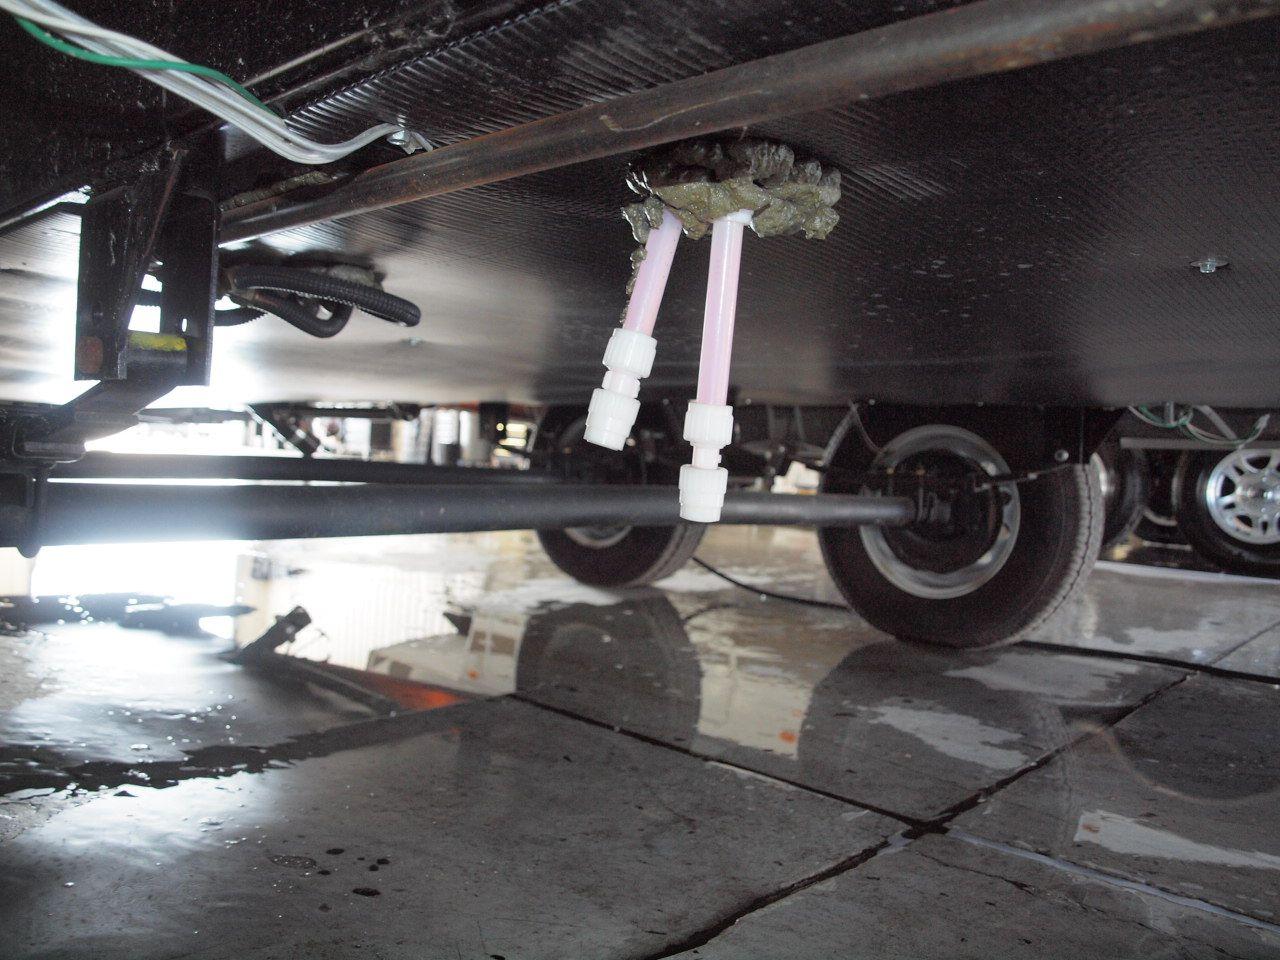 ee86f52ca13c7c92734a29373b69a8a9 United Trailer Plug Wiring Diagram on 7-wire rv plug diagram, 6 round trailer plug diagram, 4-way trailer light diagram, 7 round trailer plug diagram, 7 pronge trailer connector diagram, 7 prong trailer plug diagram, 5-way trailer light diagram,